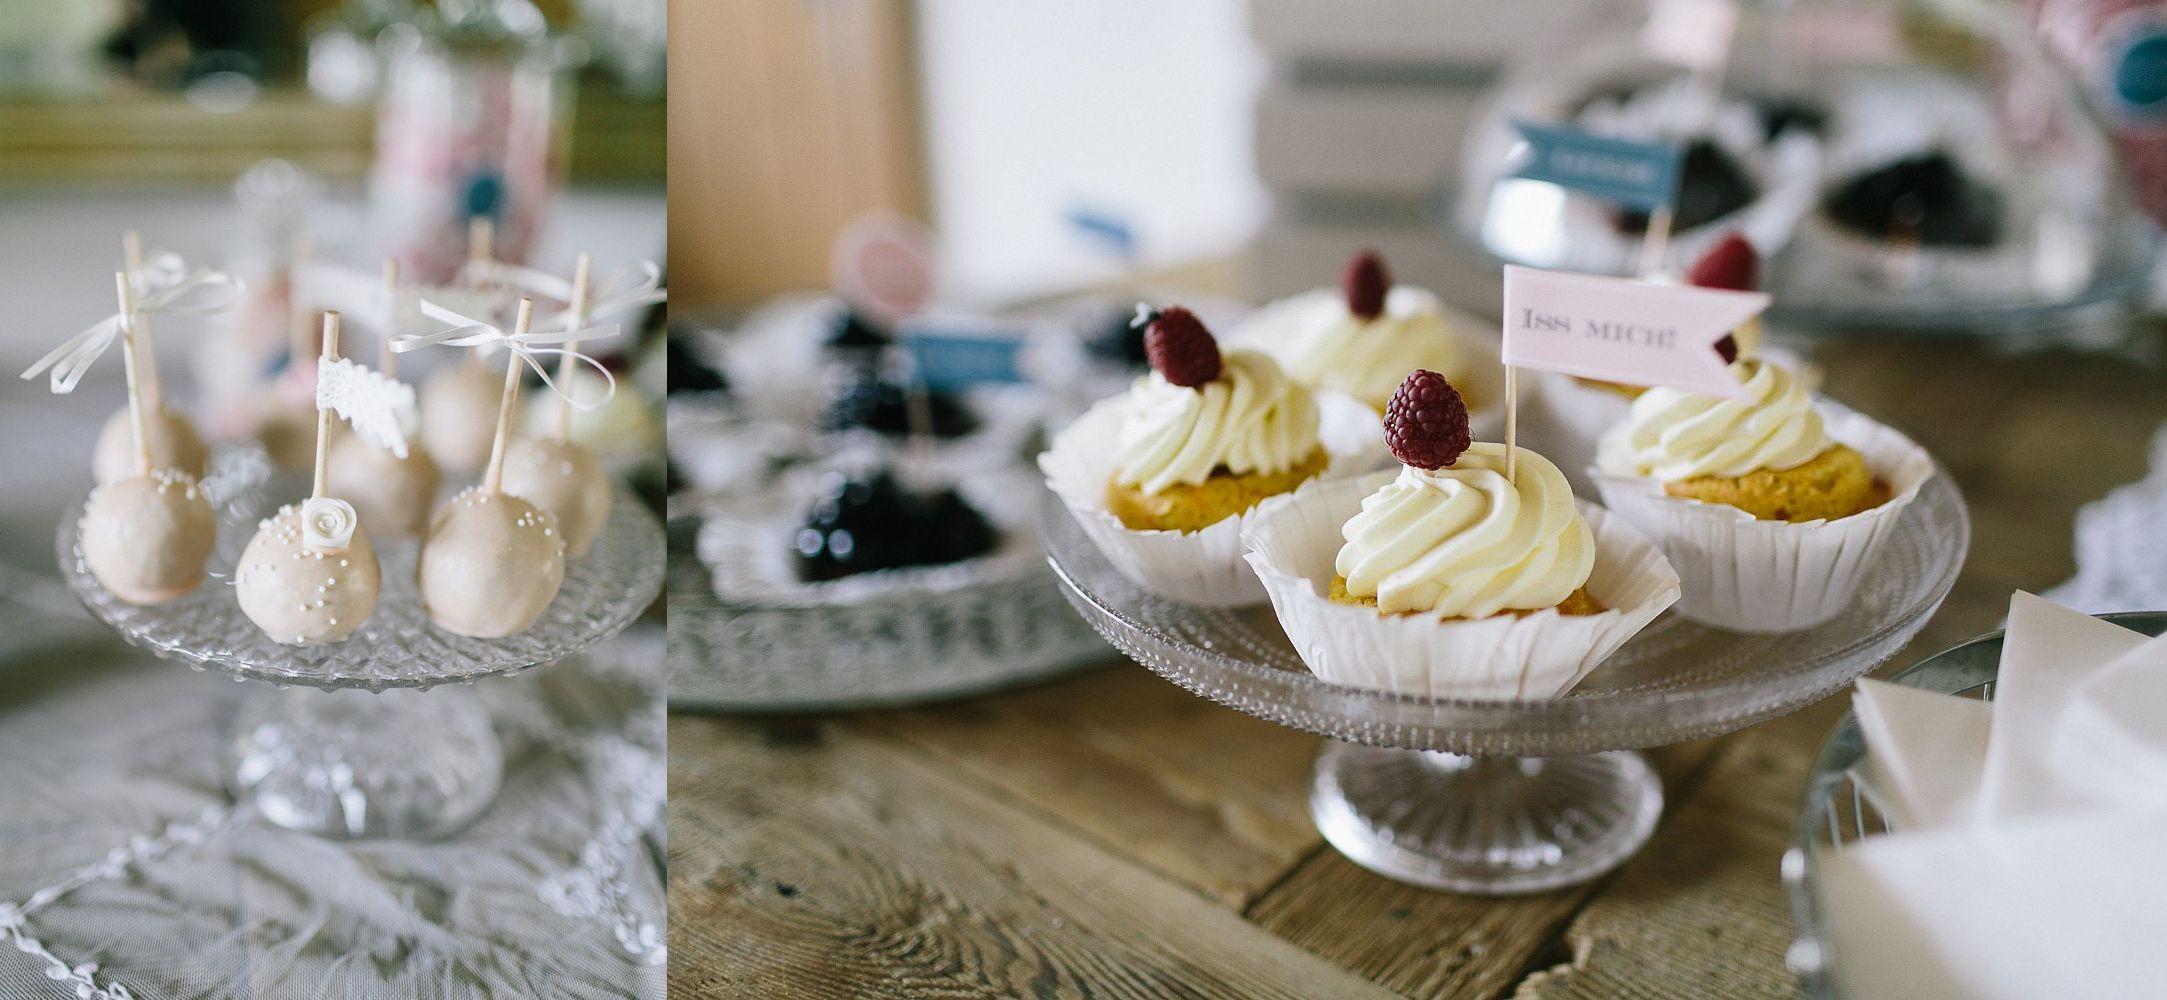 b-cake-pops-cupcakes.jpg (2167×1000)